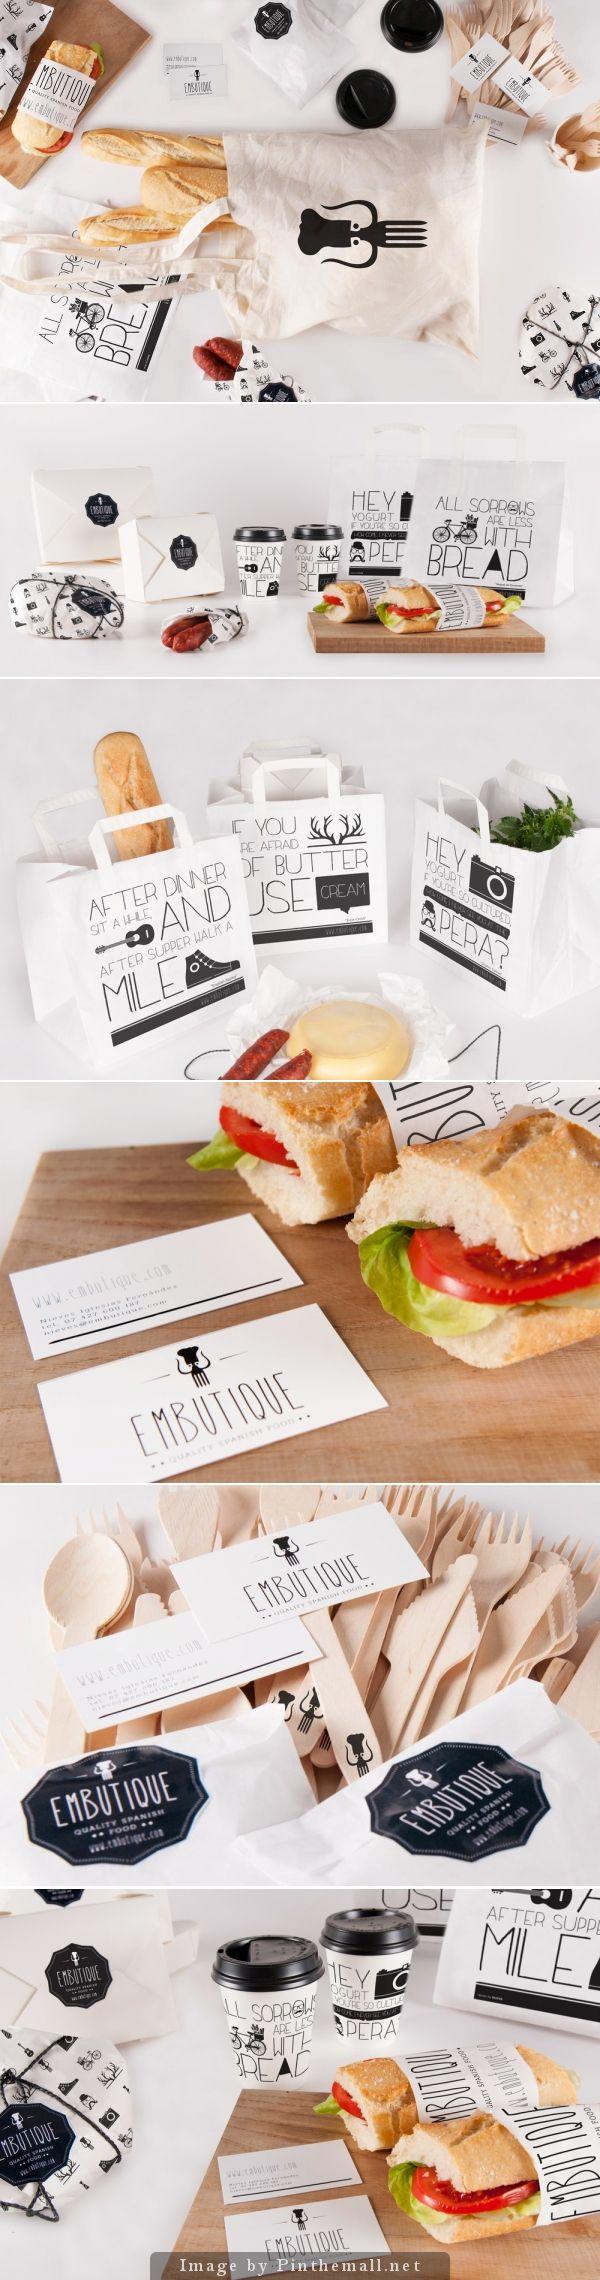 Embutique, great packaging design, sandwich, bread, innovative brand idea